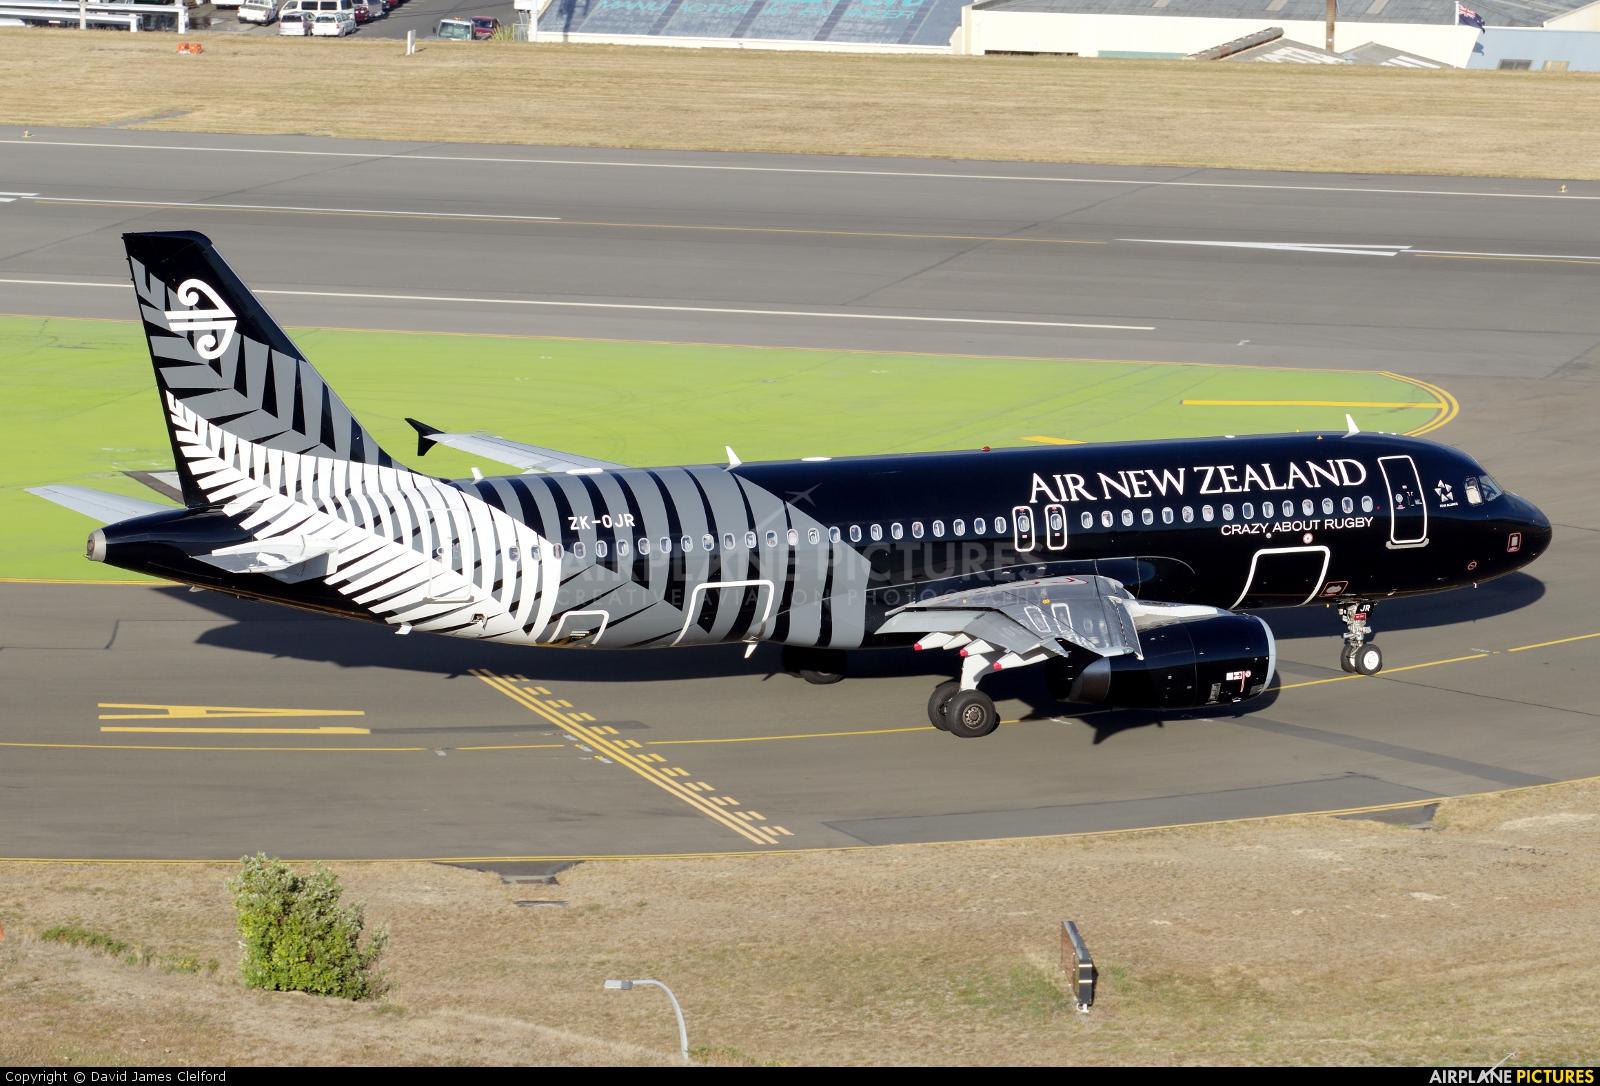 Air New Zealand ZK-OJR aircraft at Wellington Intl